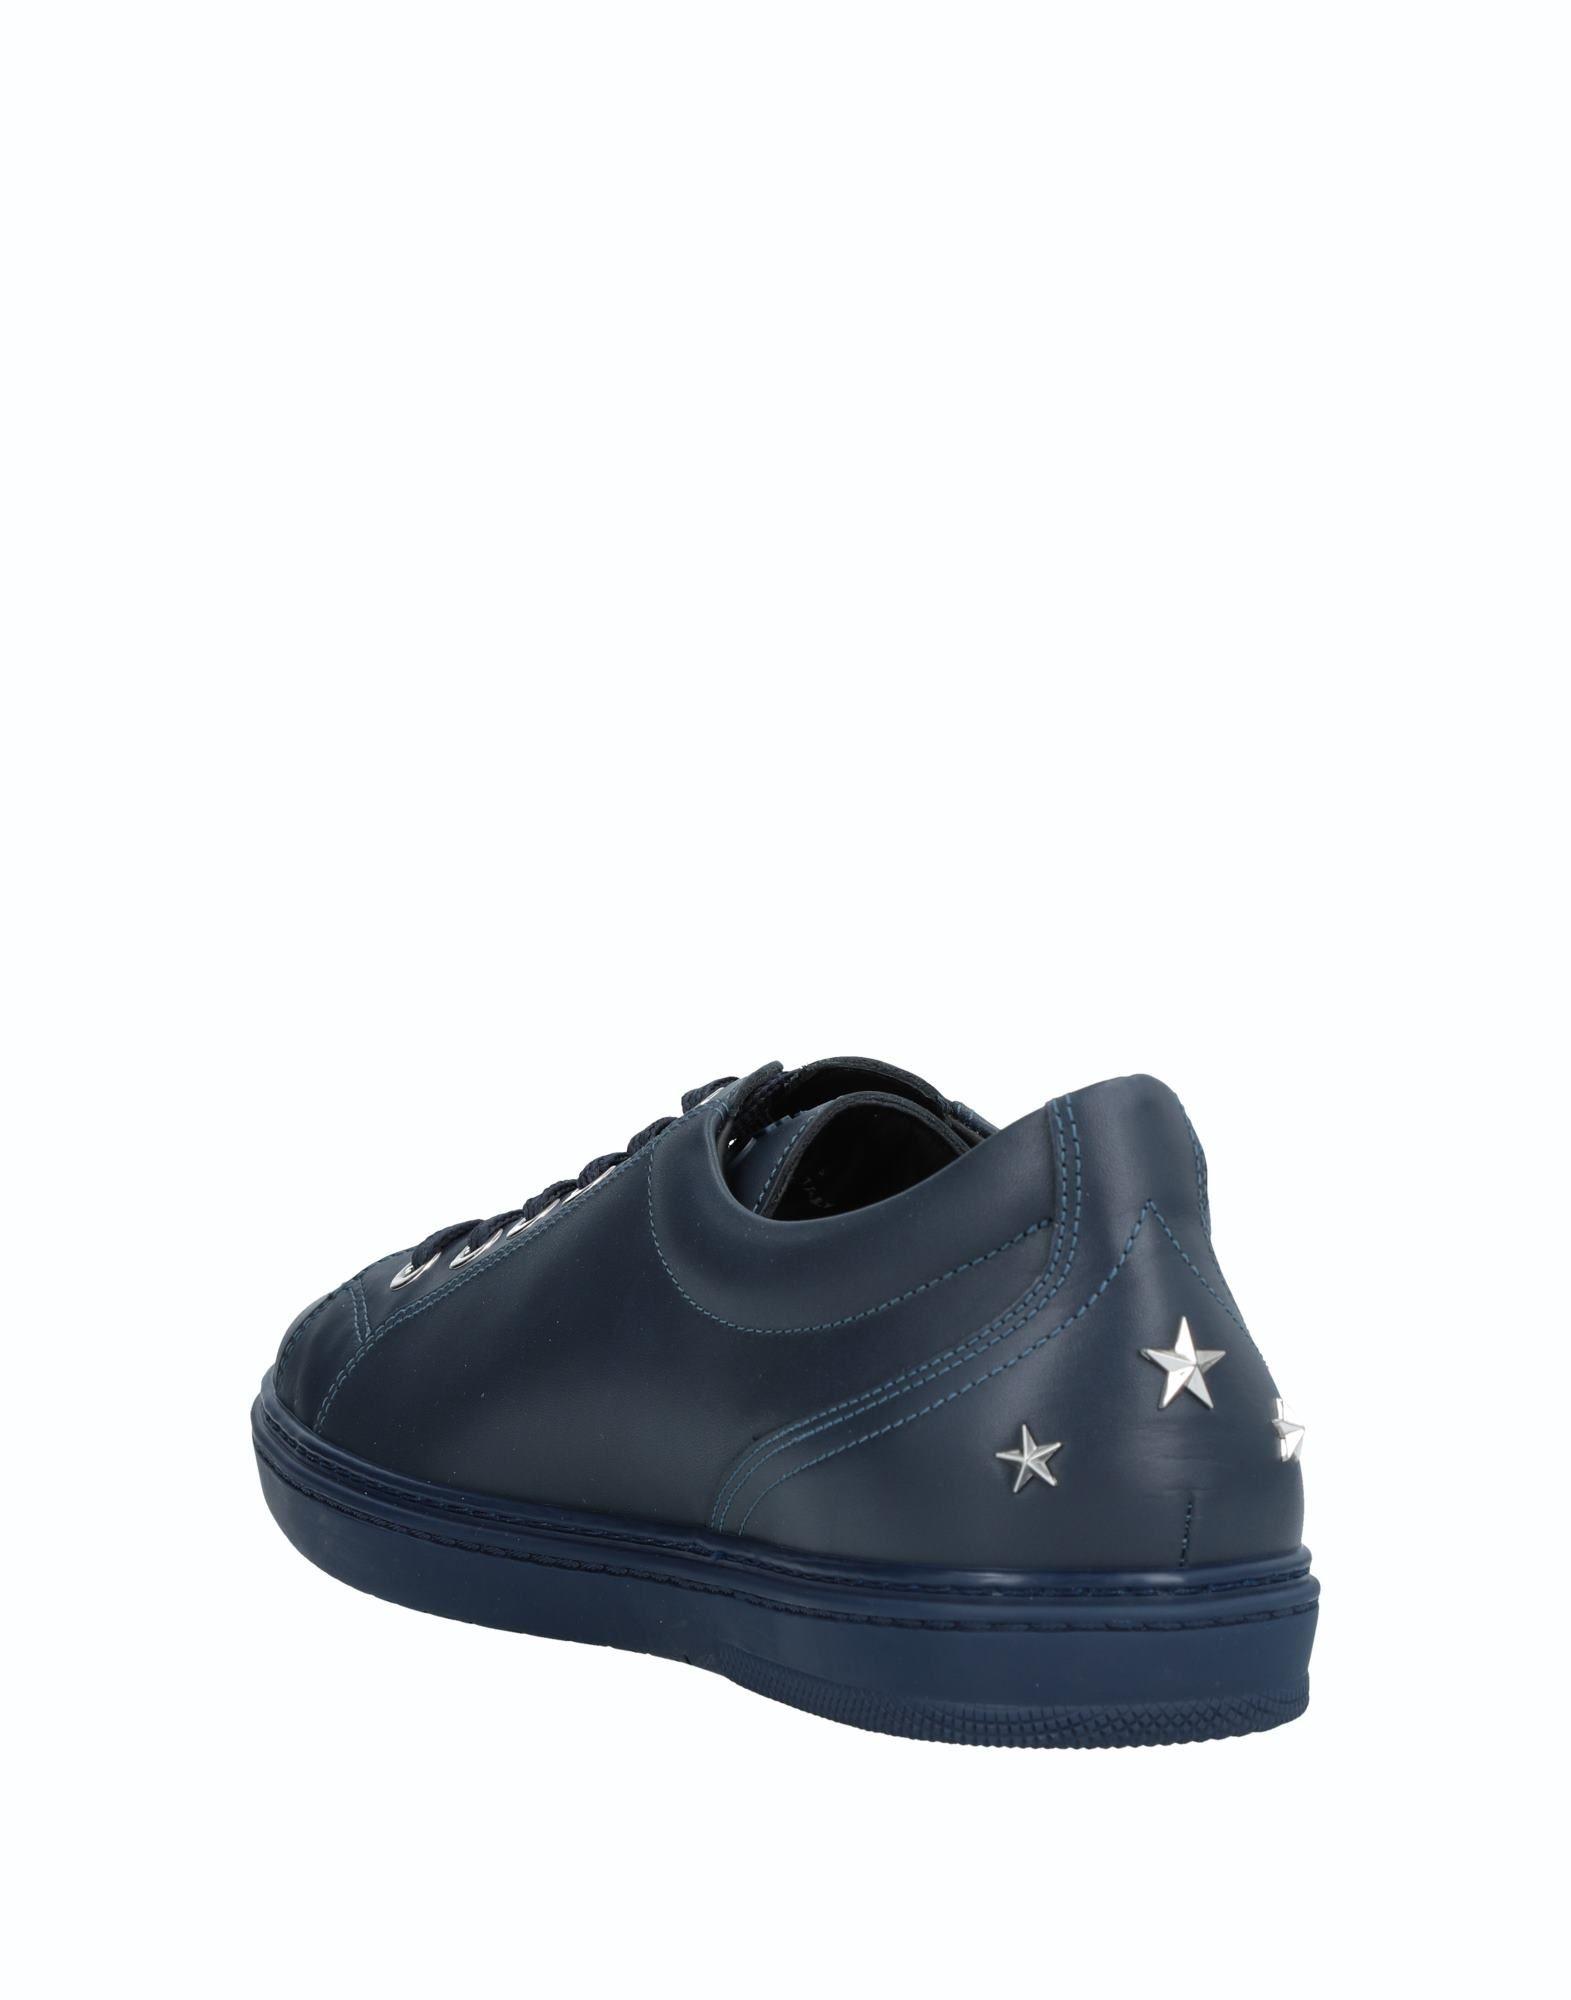 Jimmy Choo Sneakers Herren  11537870DU Gute Qualität beliebte Schuhe